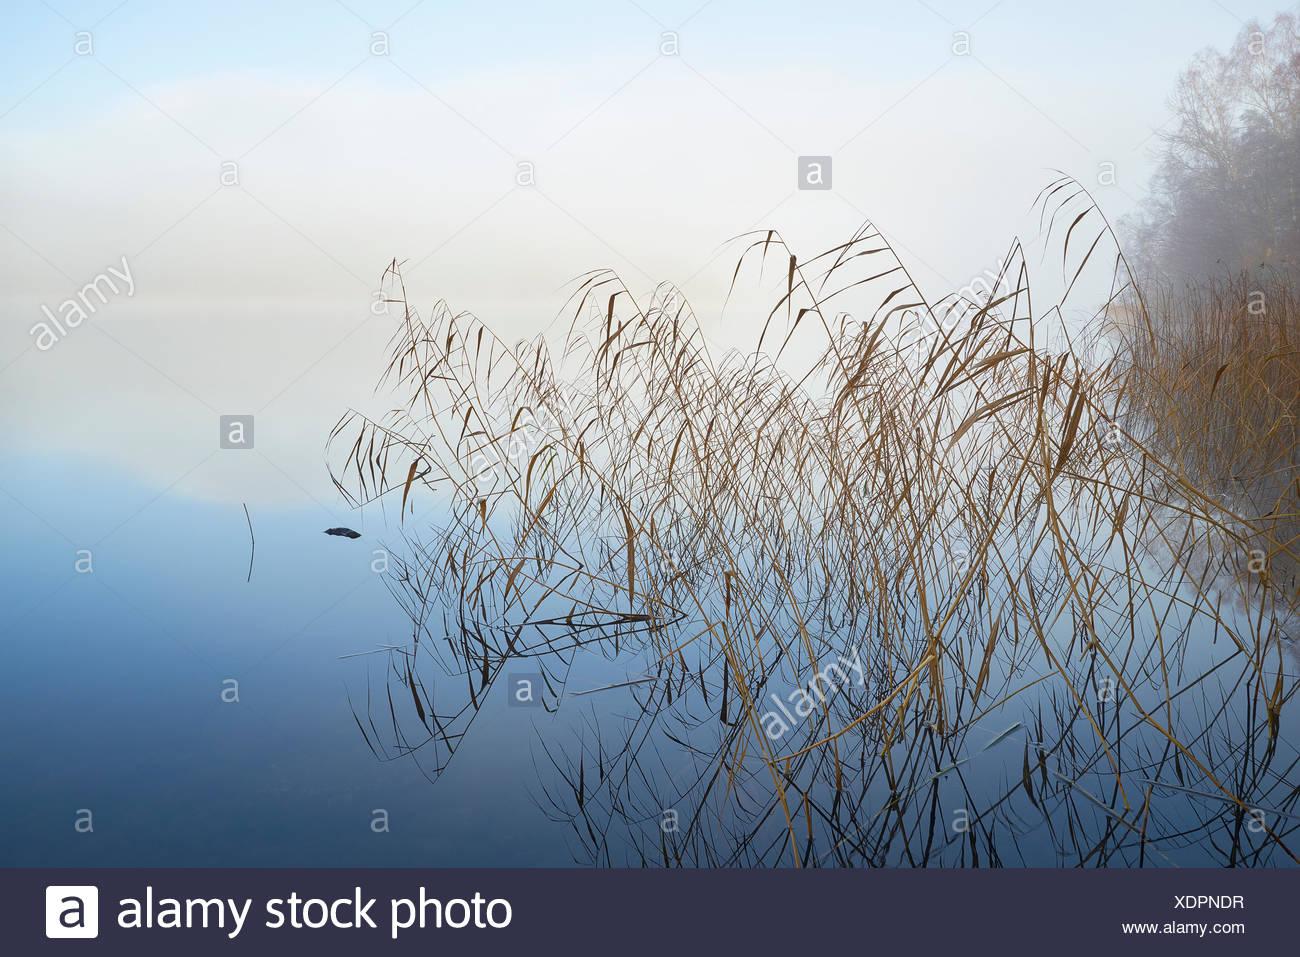 Sweden, Sodermanland, Bornsjon, Reed protruding from water - Stock Image